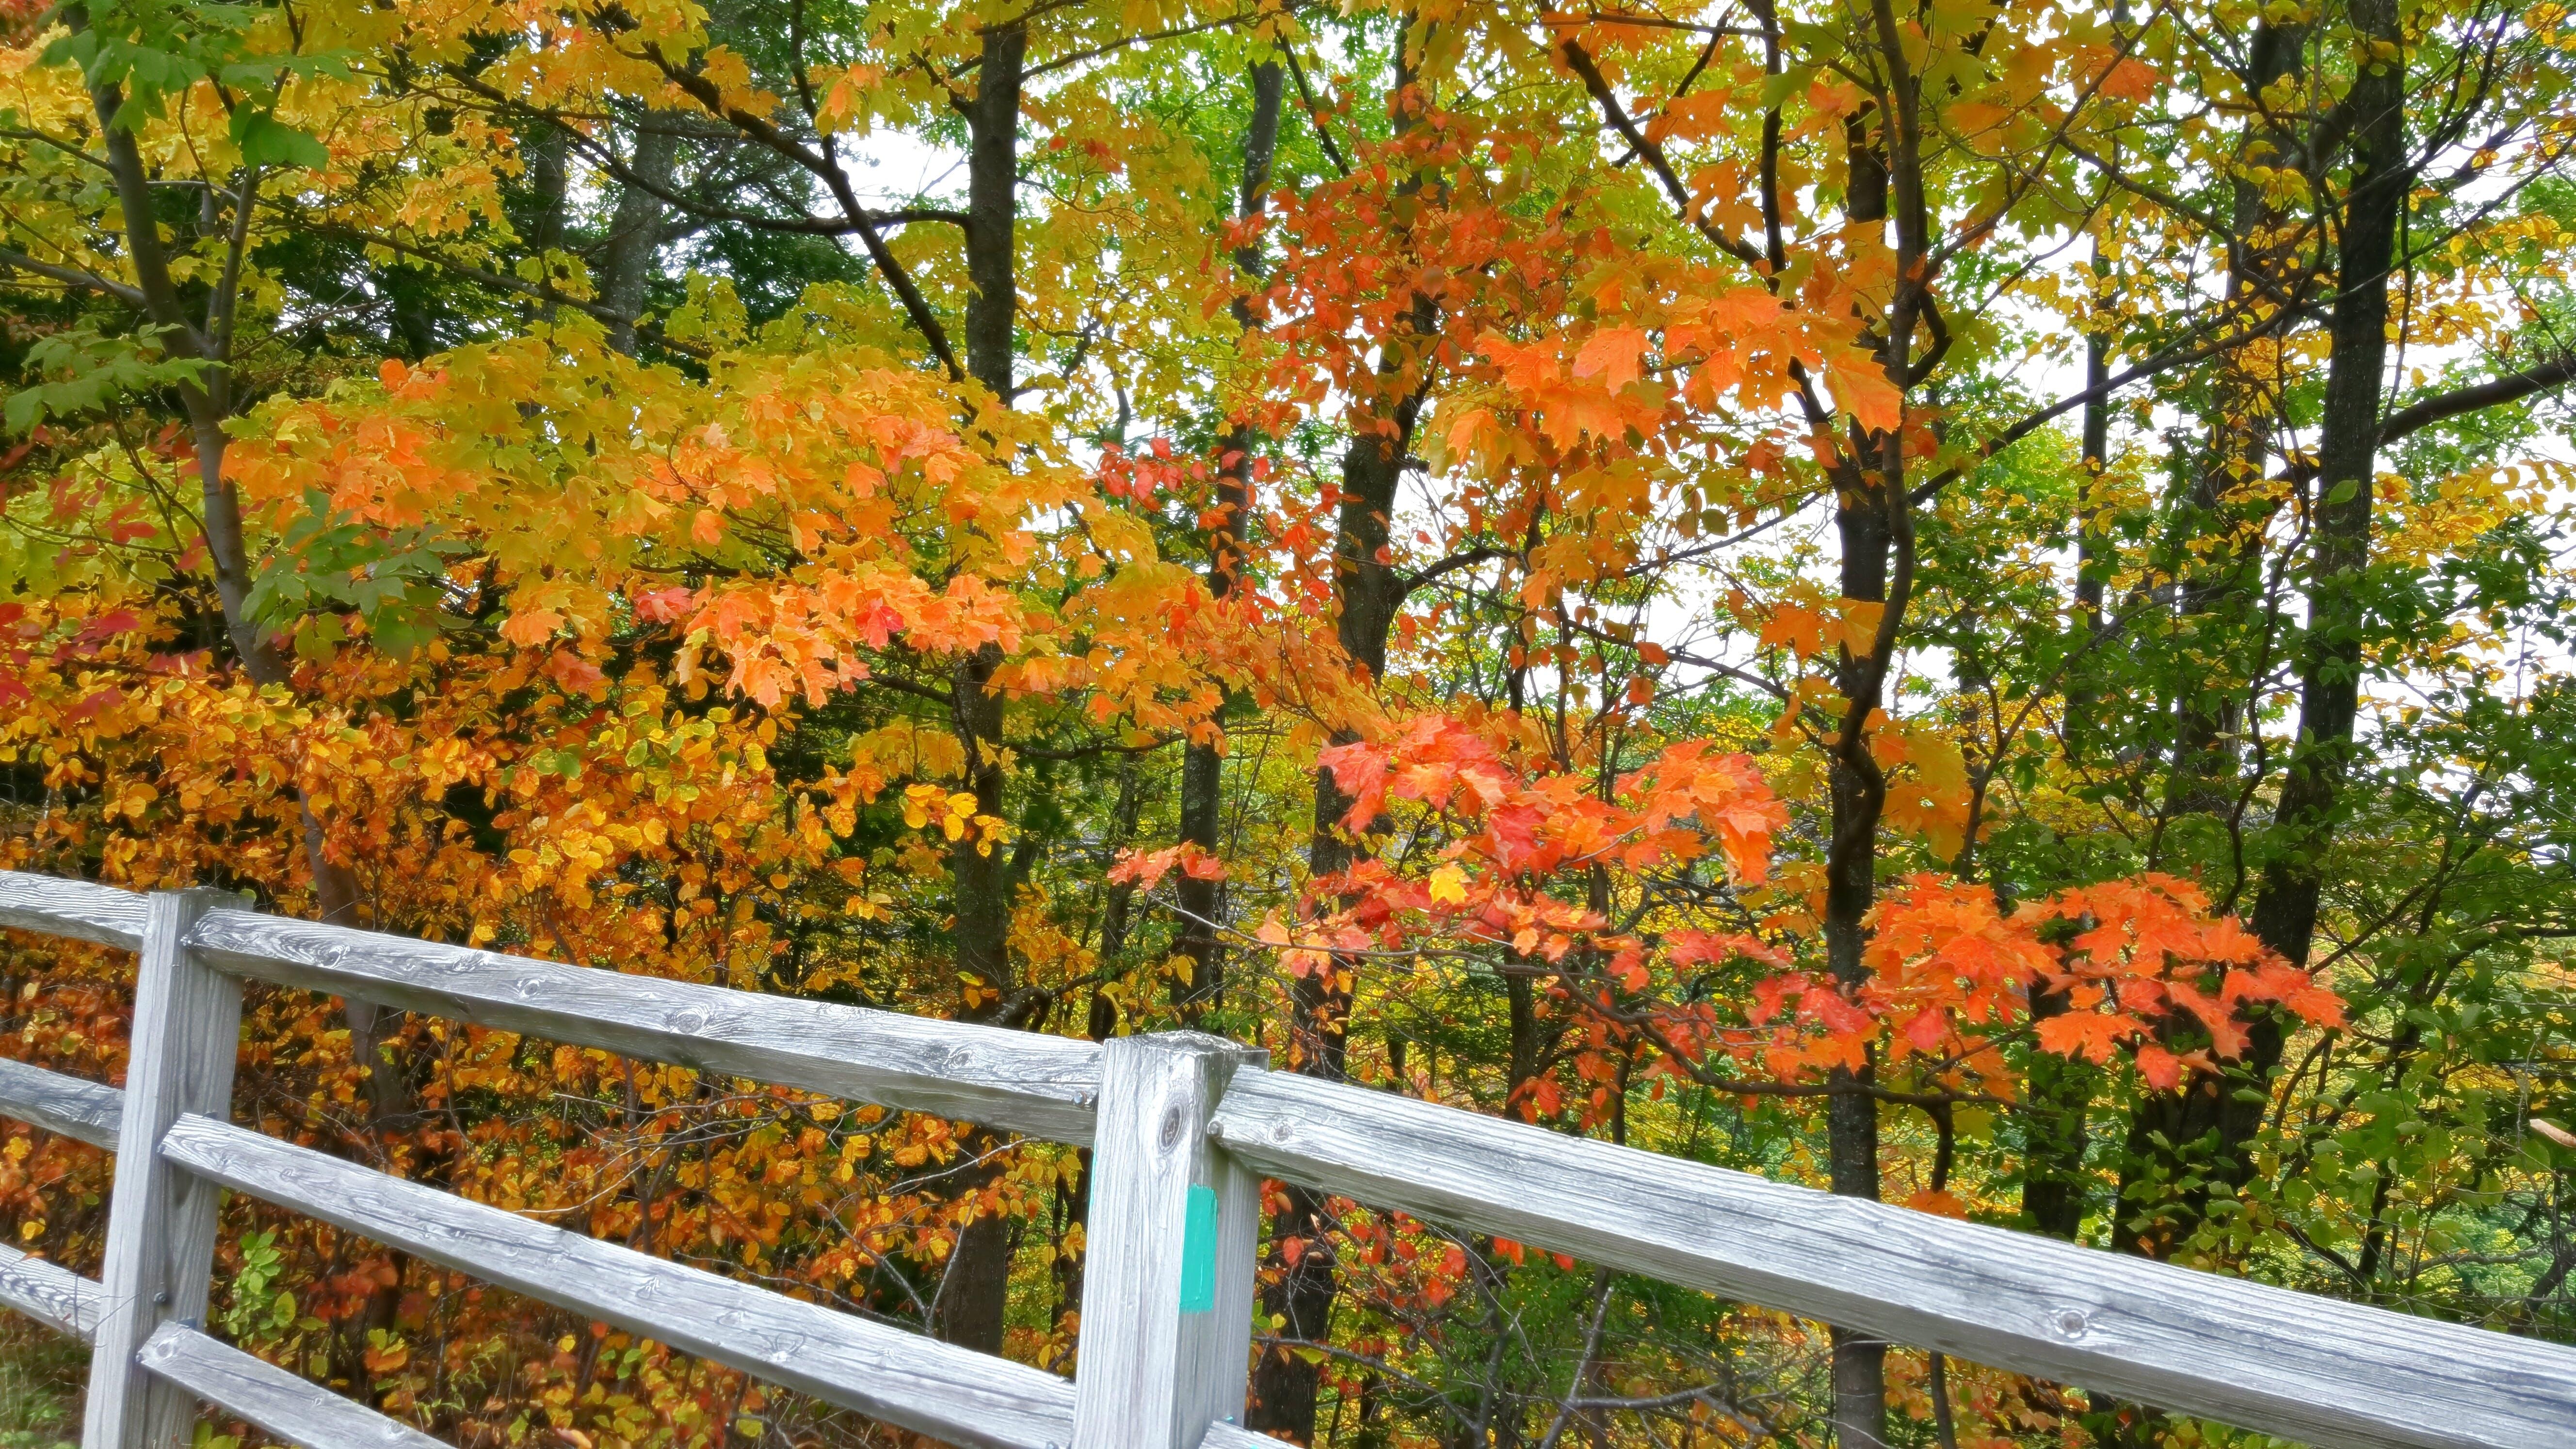 Free stock photo of colors, fall foliage, fall leaves, trees